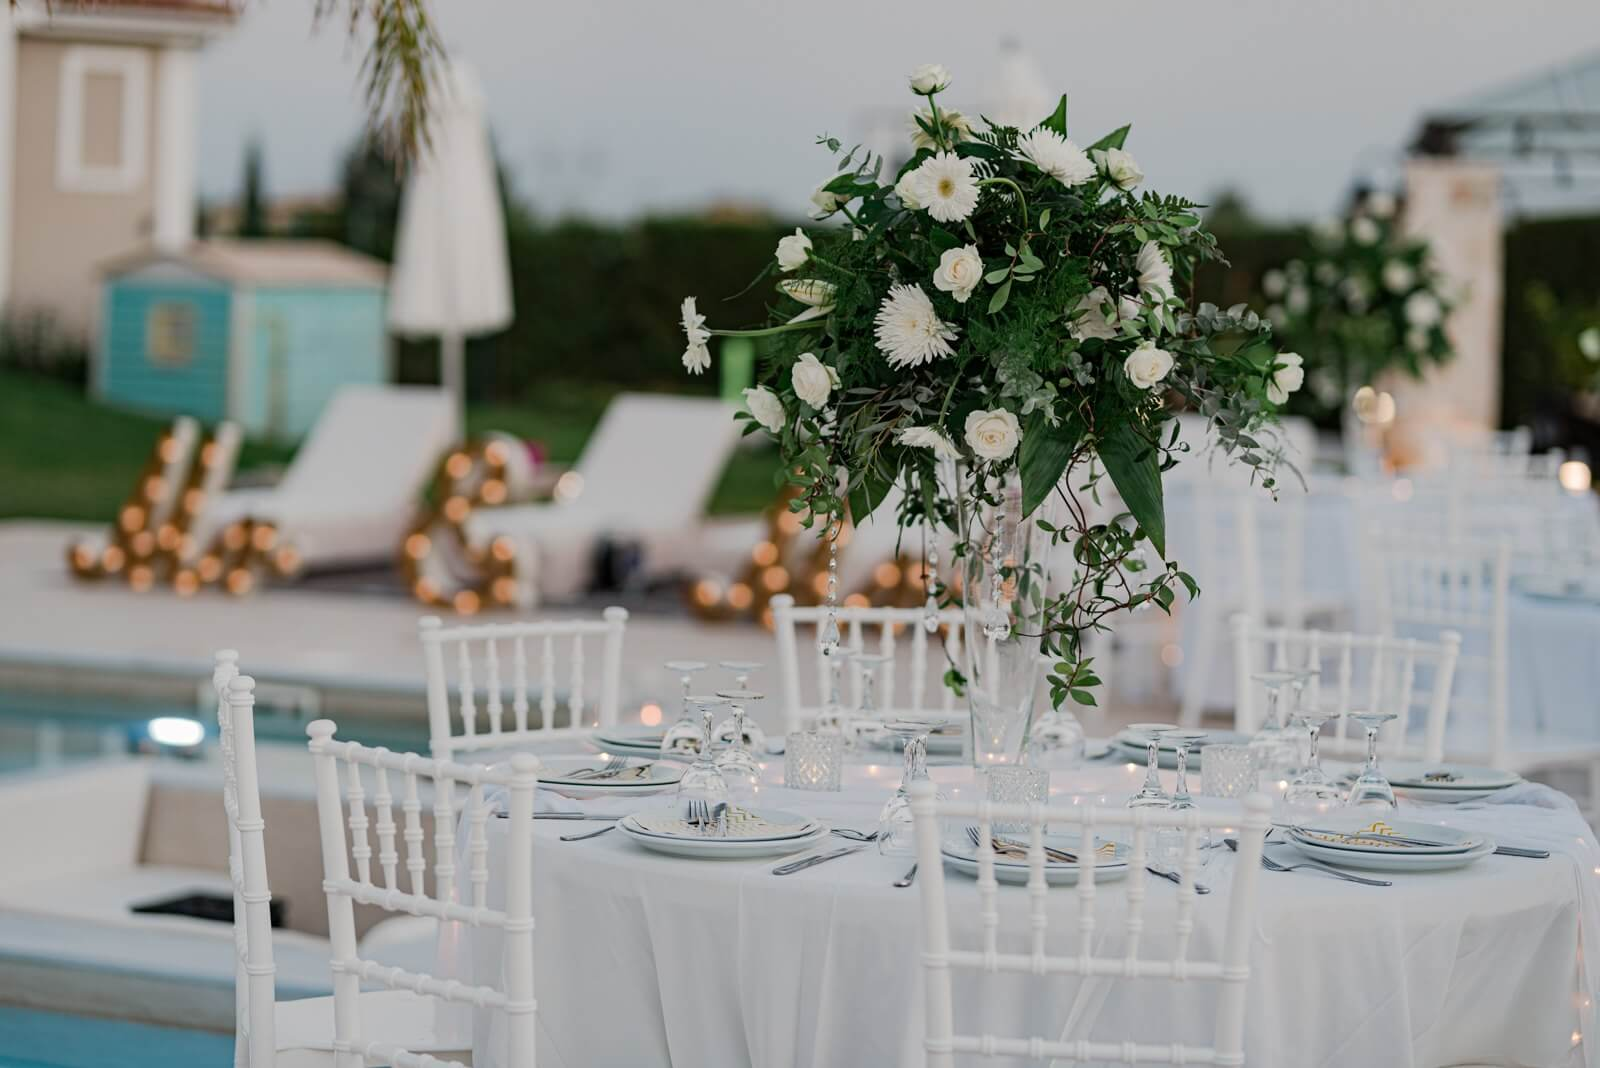 Luxury Villa Wedding Zante - By the Bridal ConsultantLuxury Villa Wedding Zante - By the Bridal Consultant